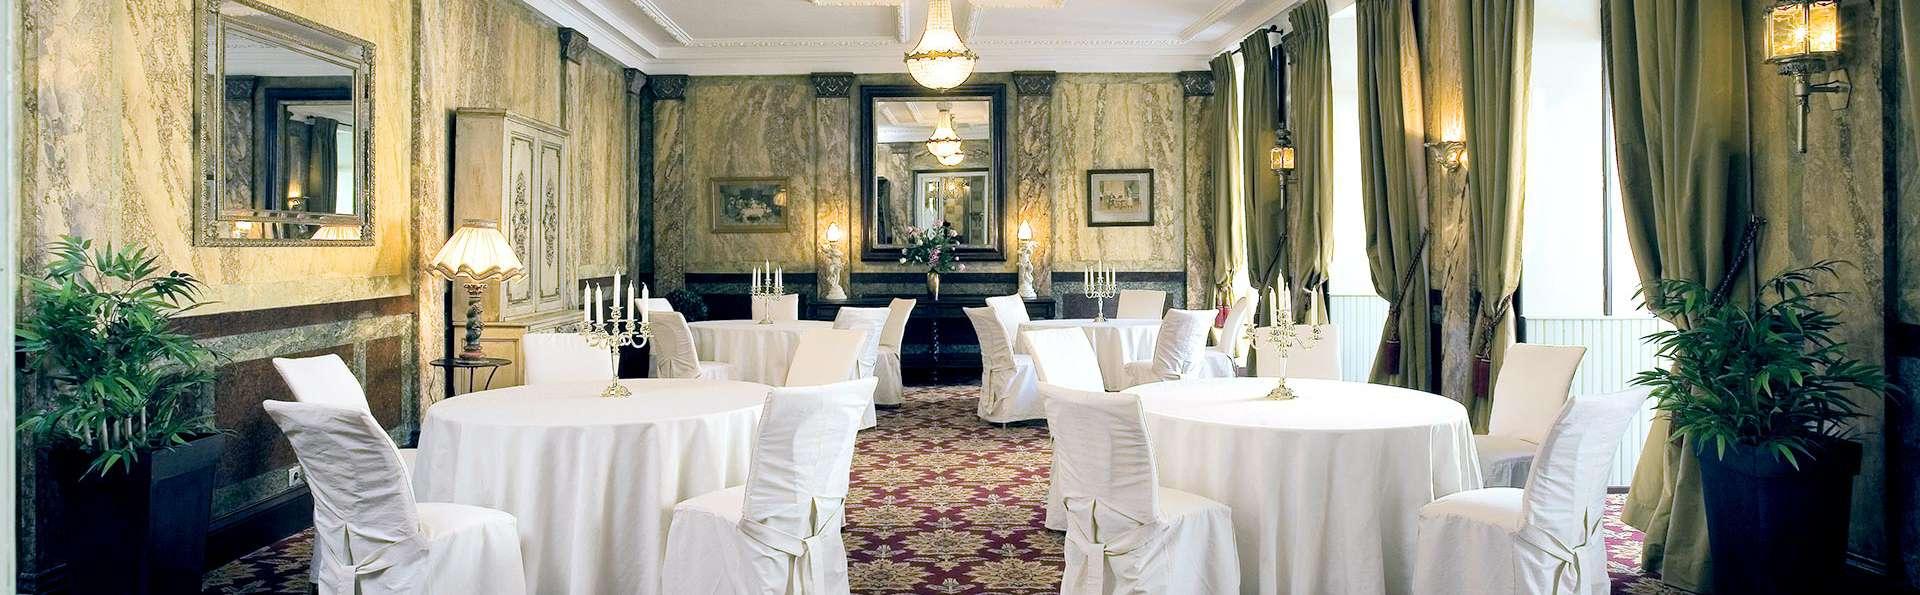 Brit Hôtel Le Clos Saint Martin - EDIT_N2_RESTAURANT.jpg